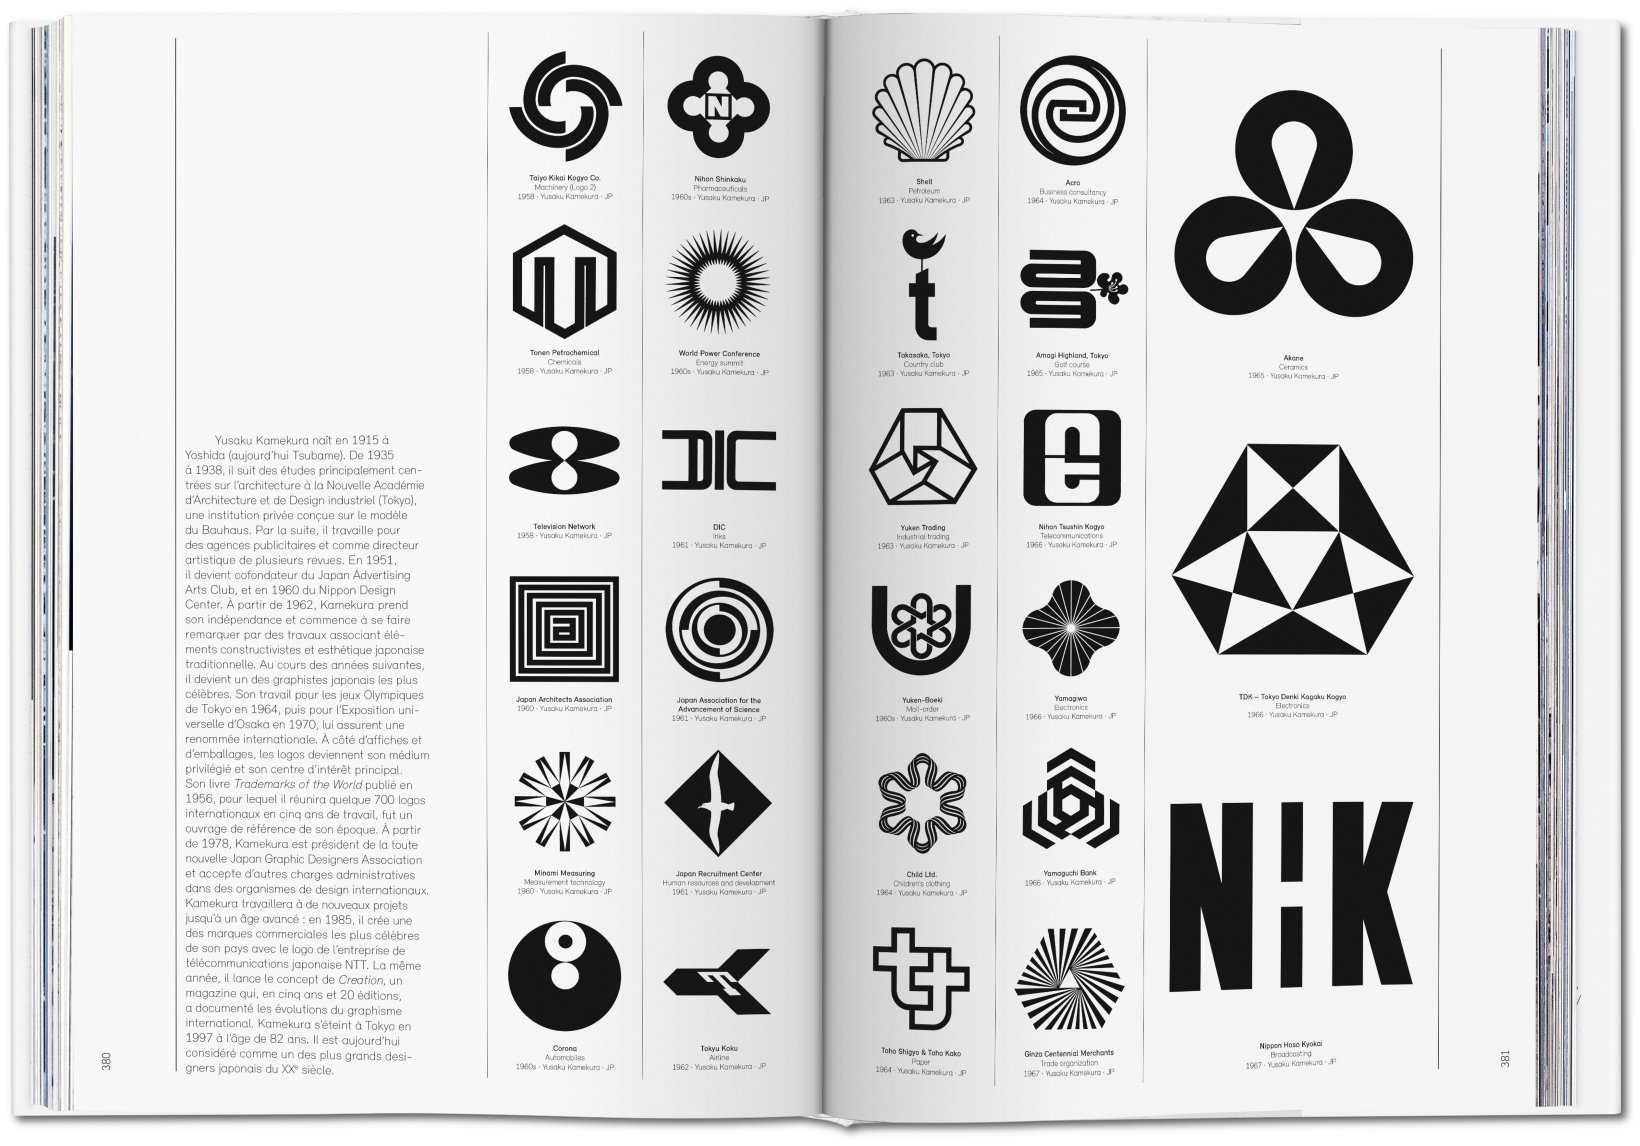 logo_modernism_ju_int_open_0380_0381_02879_1509101011_id_995156